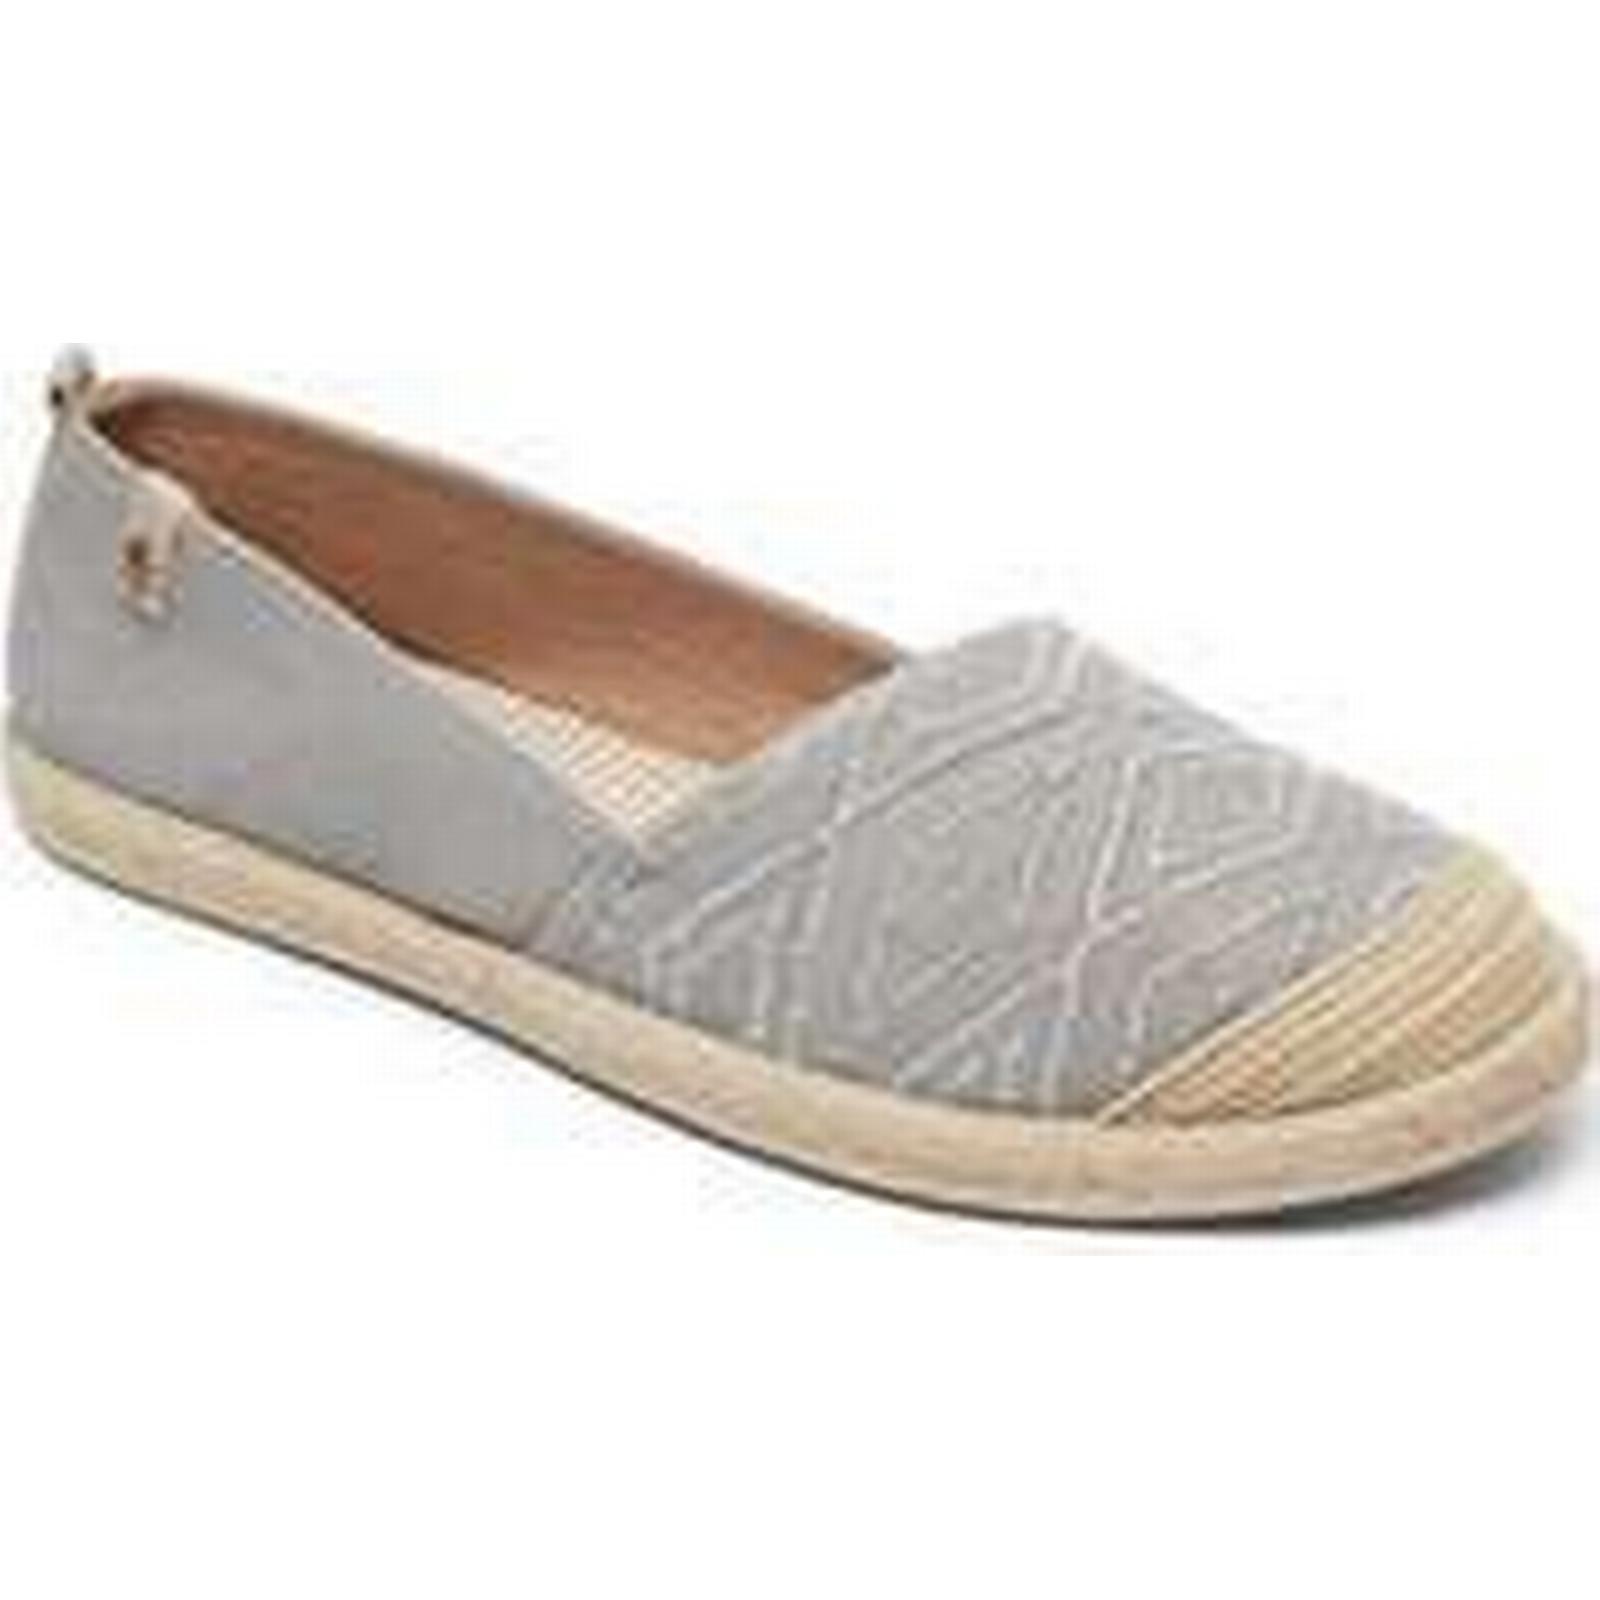 Spartoo.co.uk women's Roxy ALPARGATA-TAU ARJS600412 women's Spartoo.co.uk Shoes (Trainers) in Grey 436c4f